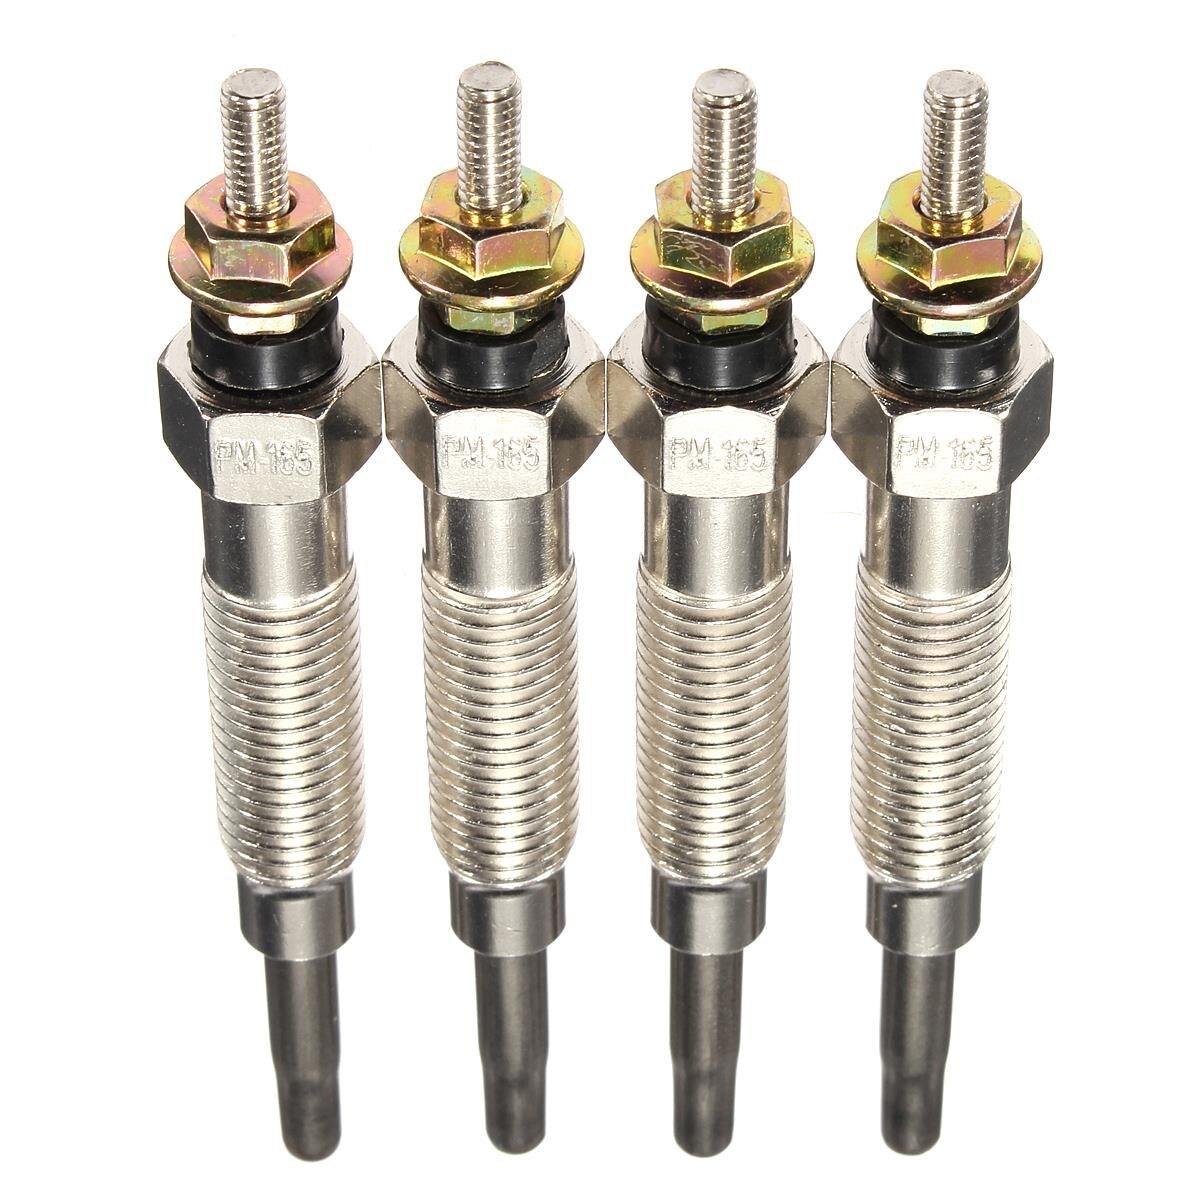 4 pçs/pçs/set calefator fulgor plugues para mitsubishi/shogun/pajero/2.8/4m40t/4m40/gp5501